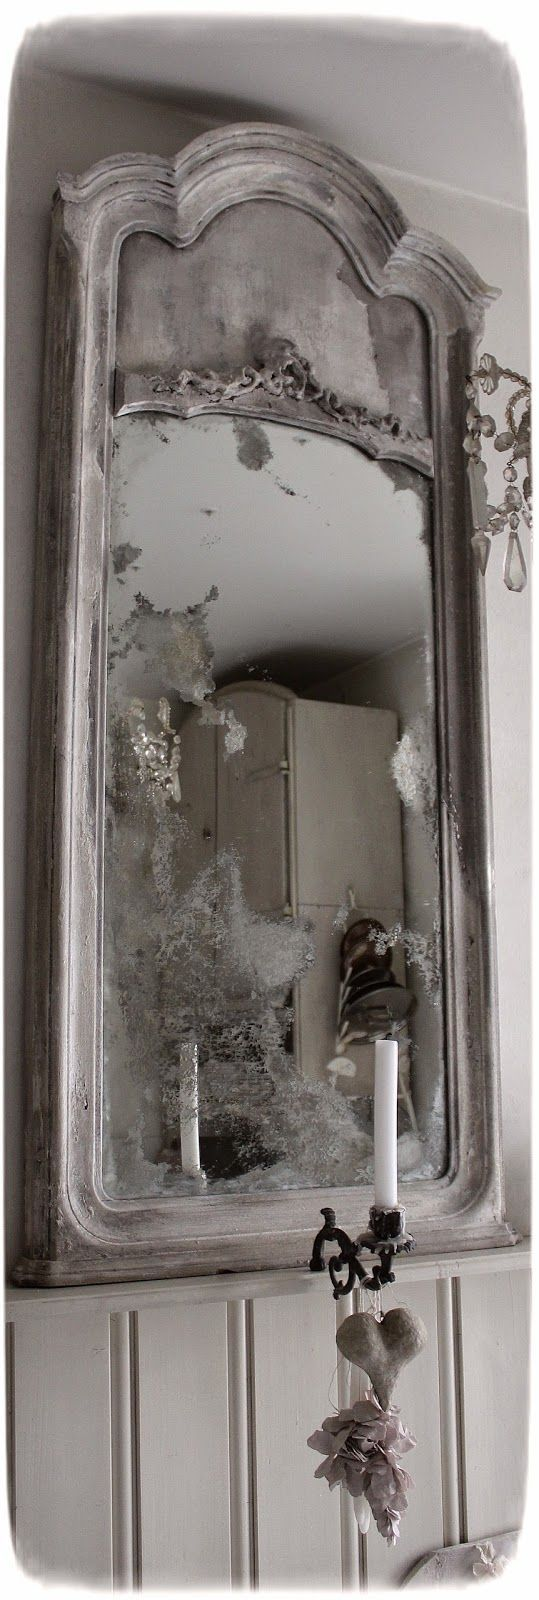 Mirror magic ❥Repinned by www.huttonandhutt...